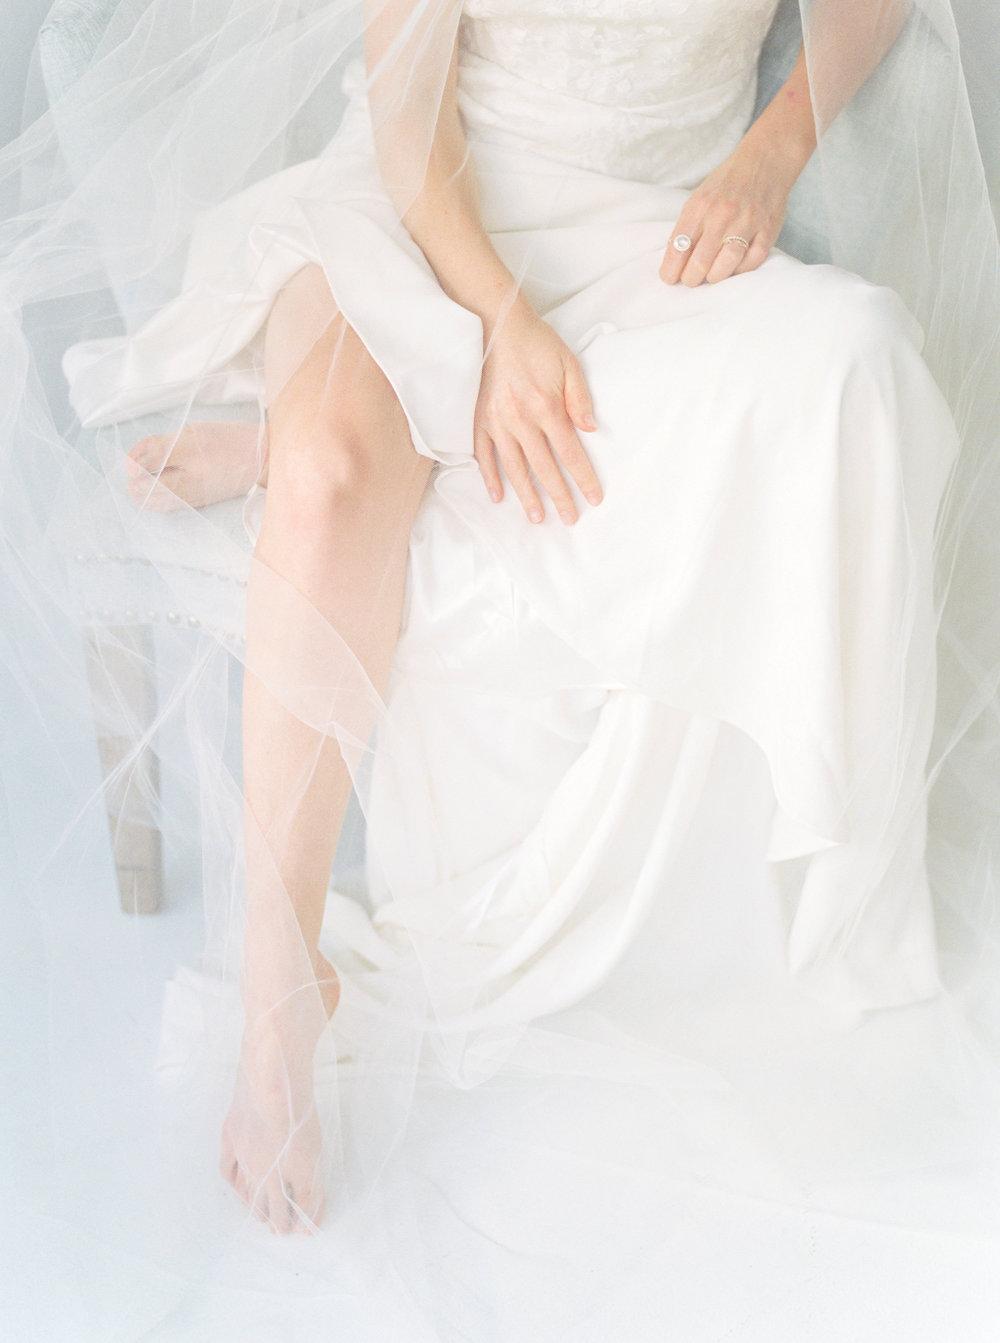 haley-richter-photography-liberty-and-lace-philadelphia-wedding-dress-boutique-079.jpg